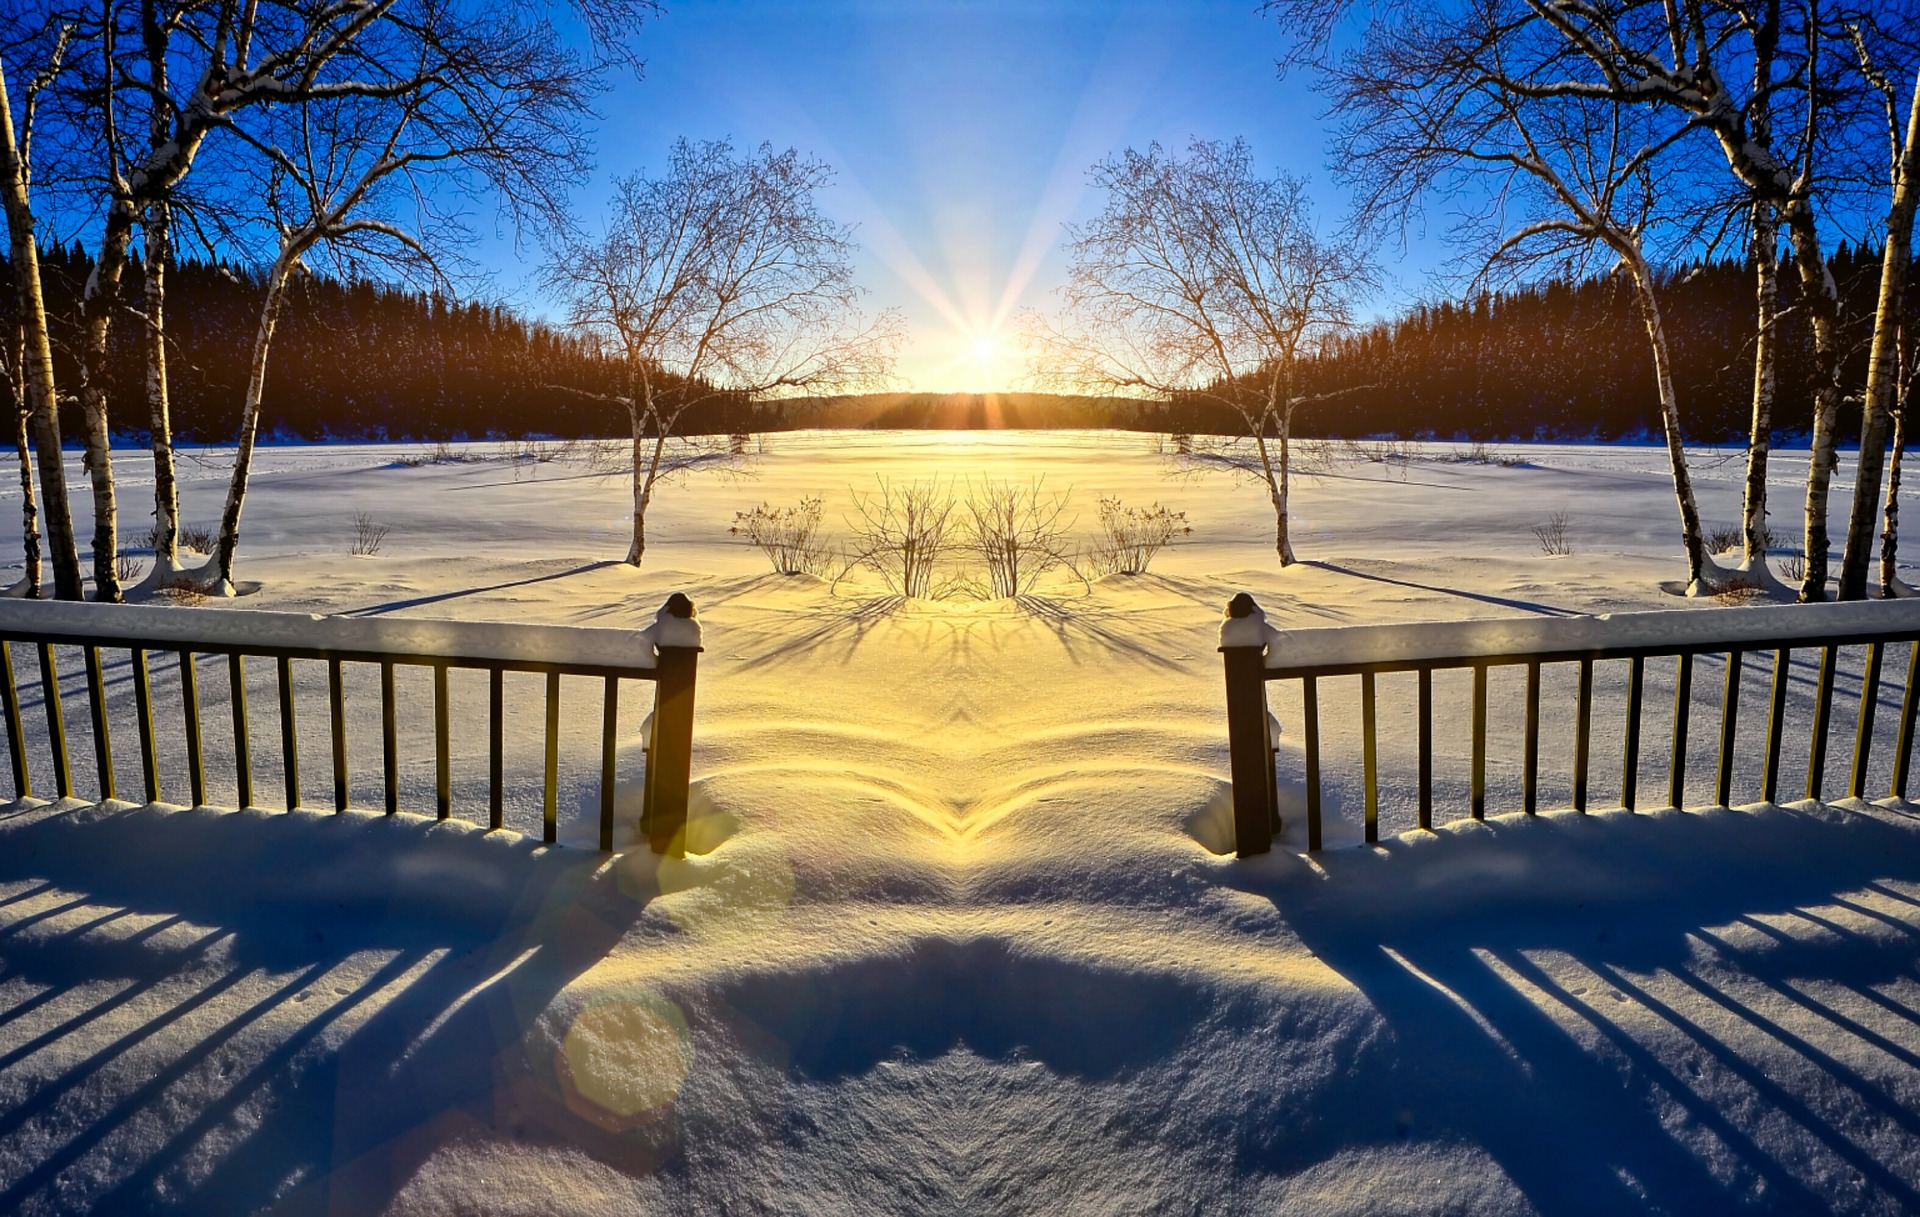 sunset in snowy landscape